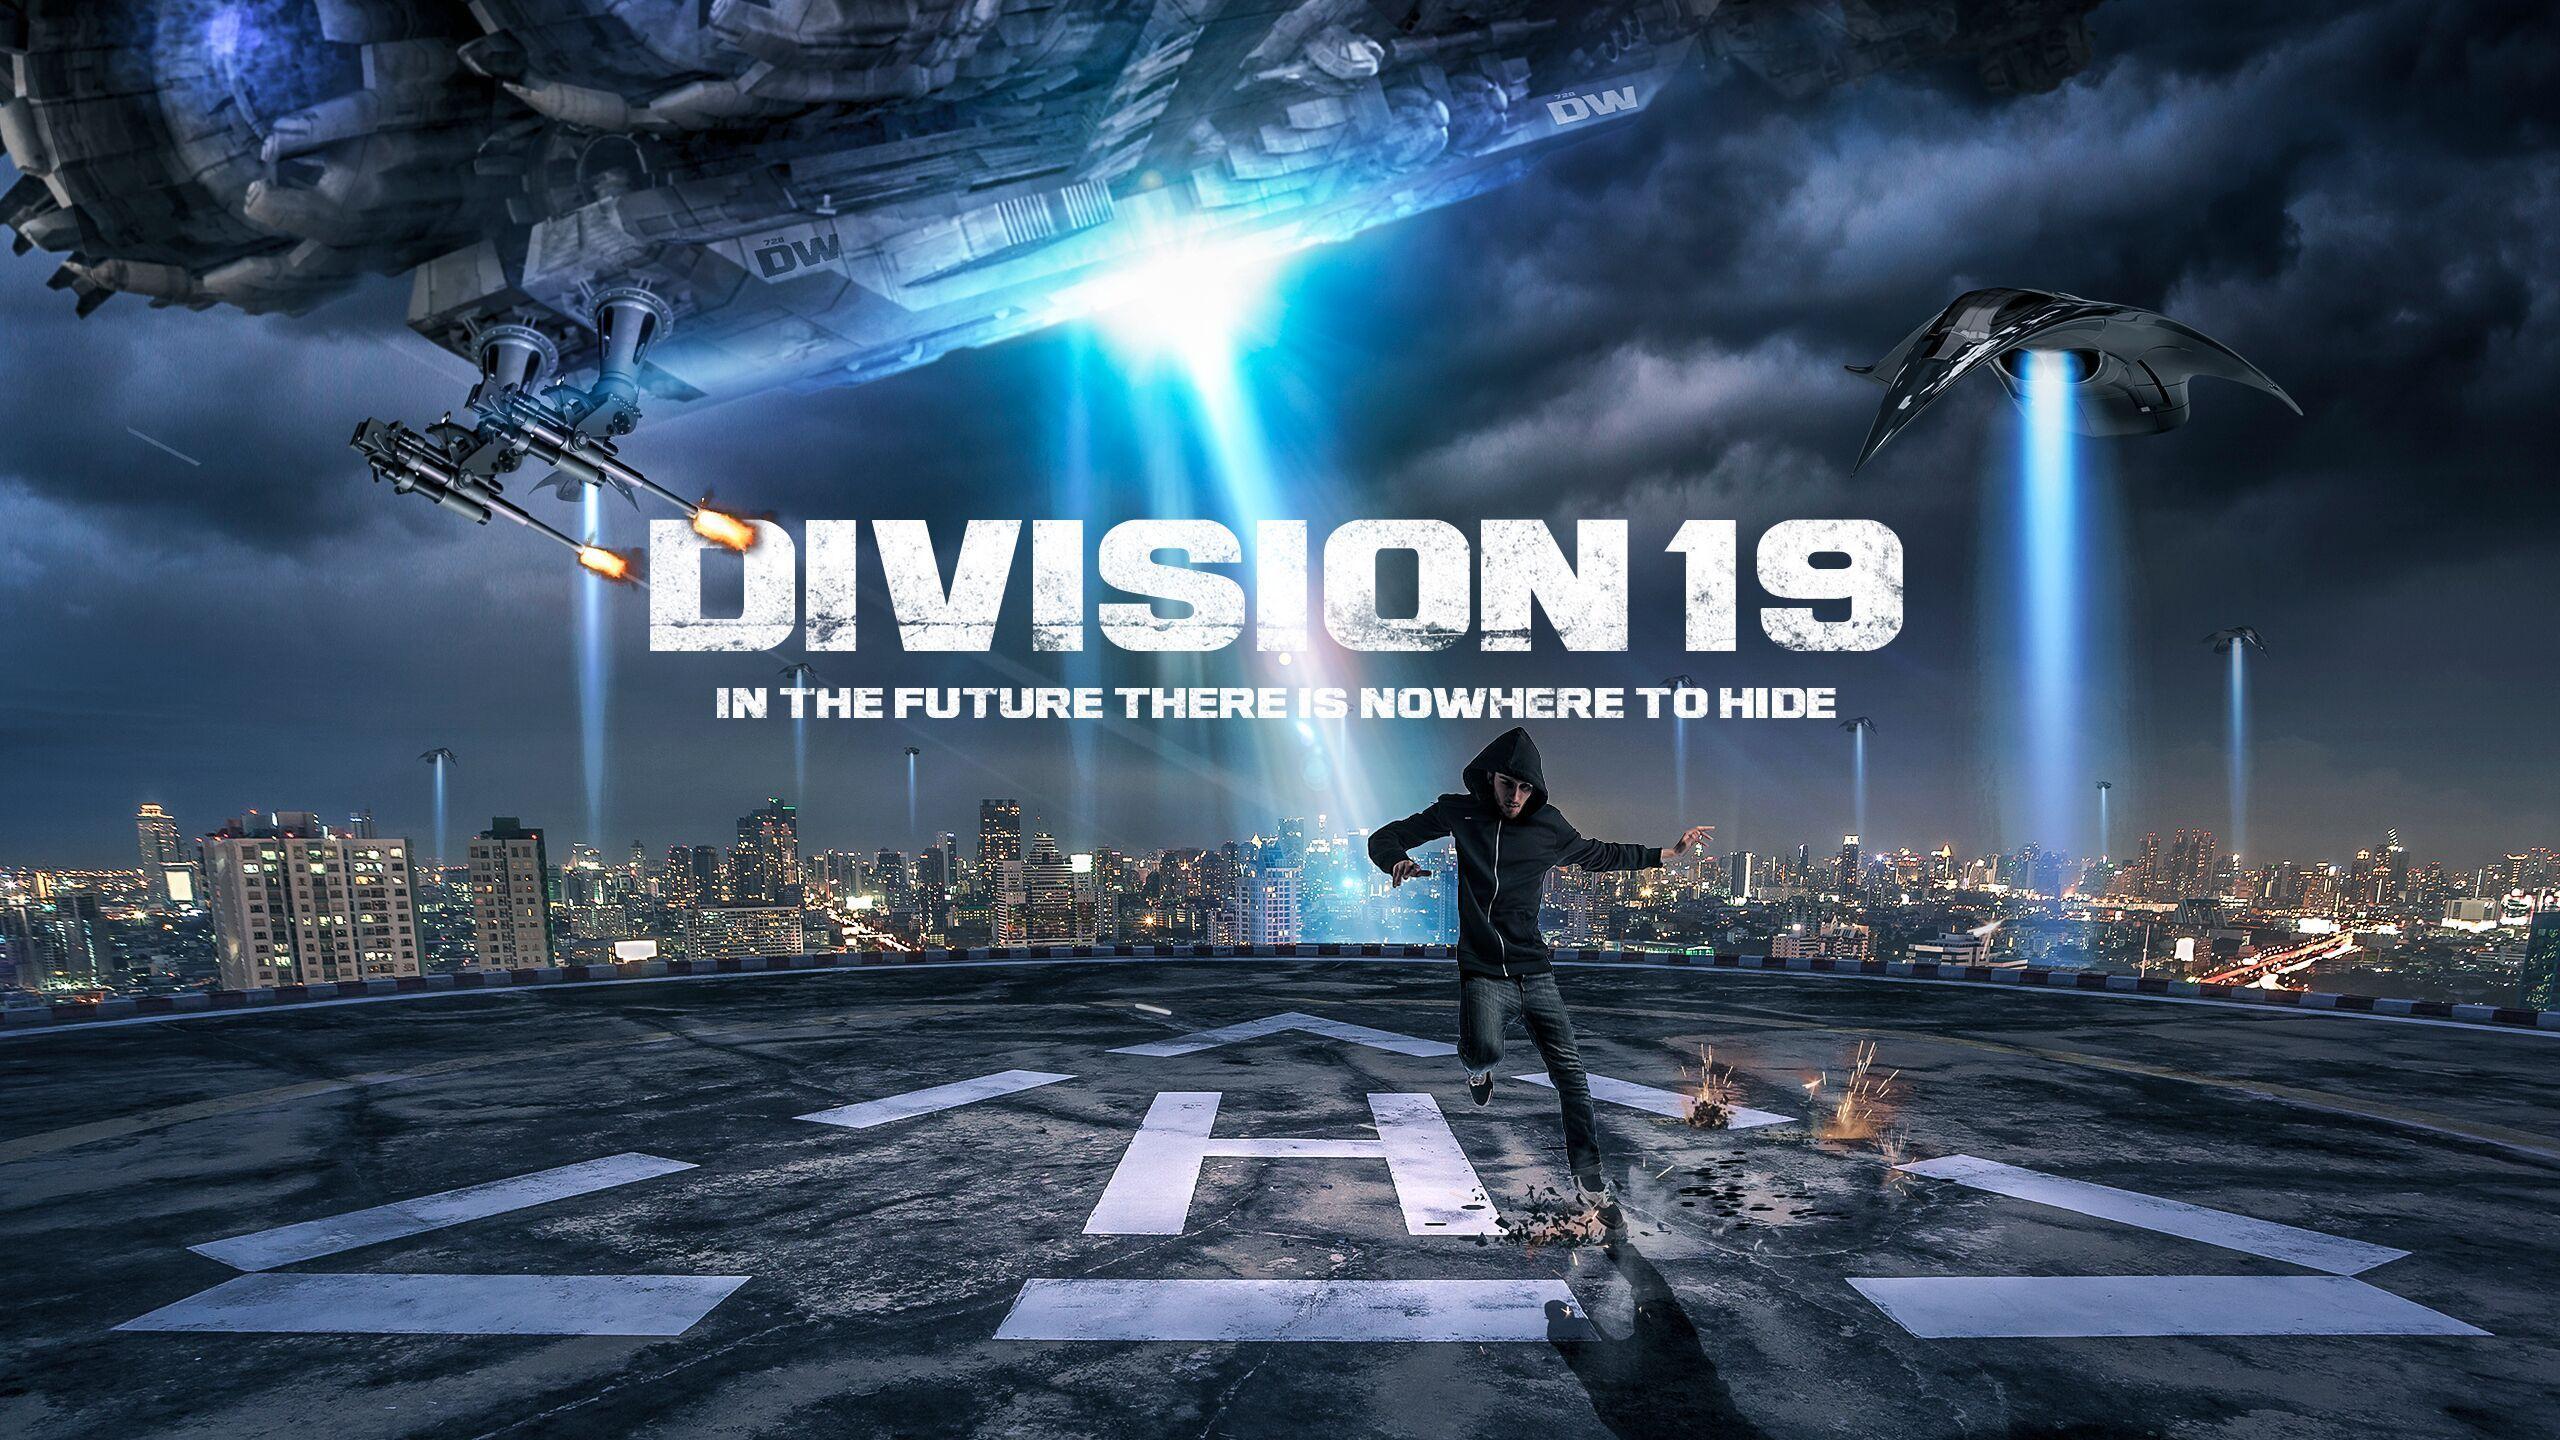 Division 19 2017